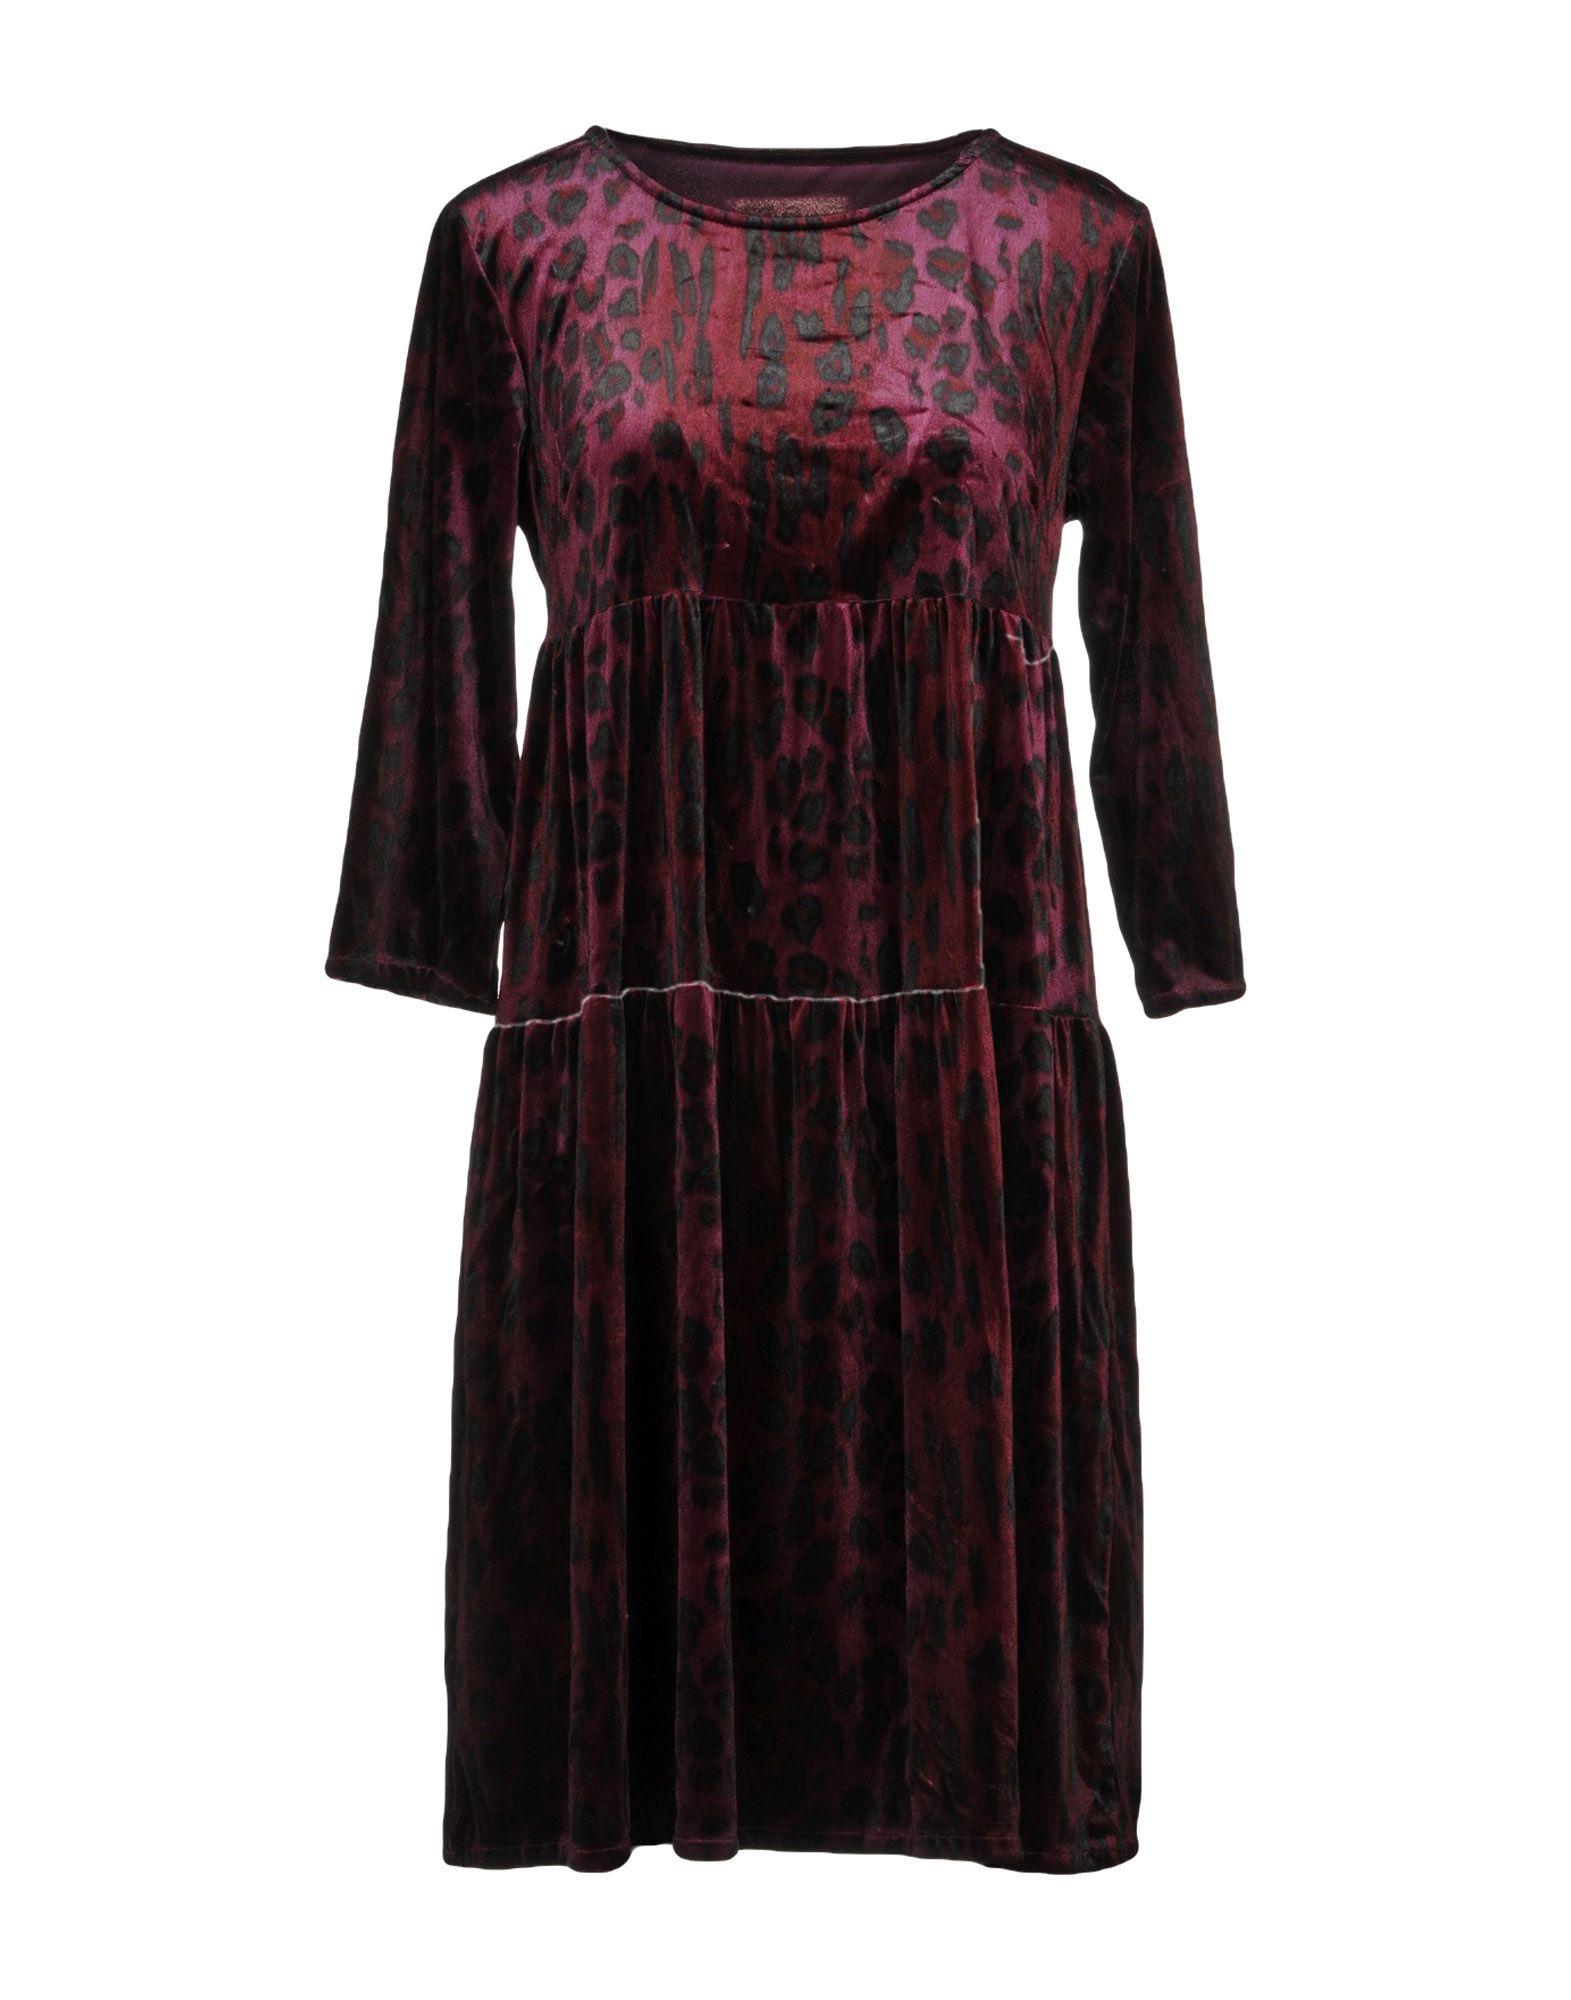 Vestito Corto Pink Memories Donna - Acquista online su KaQnT2h